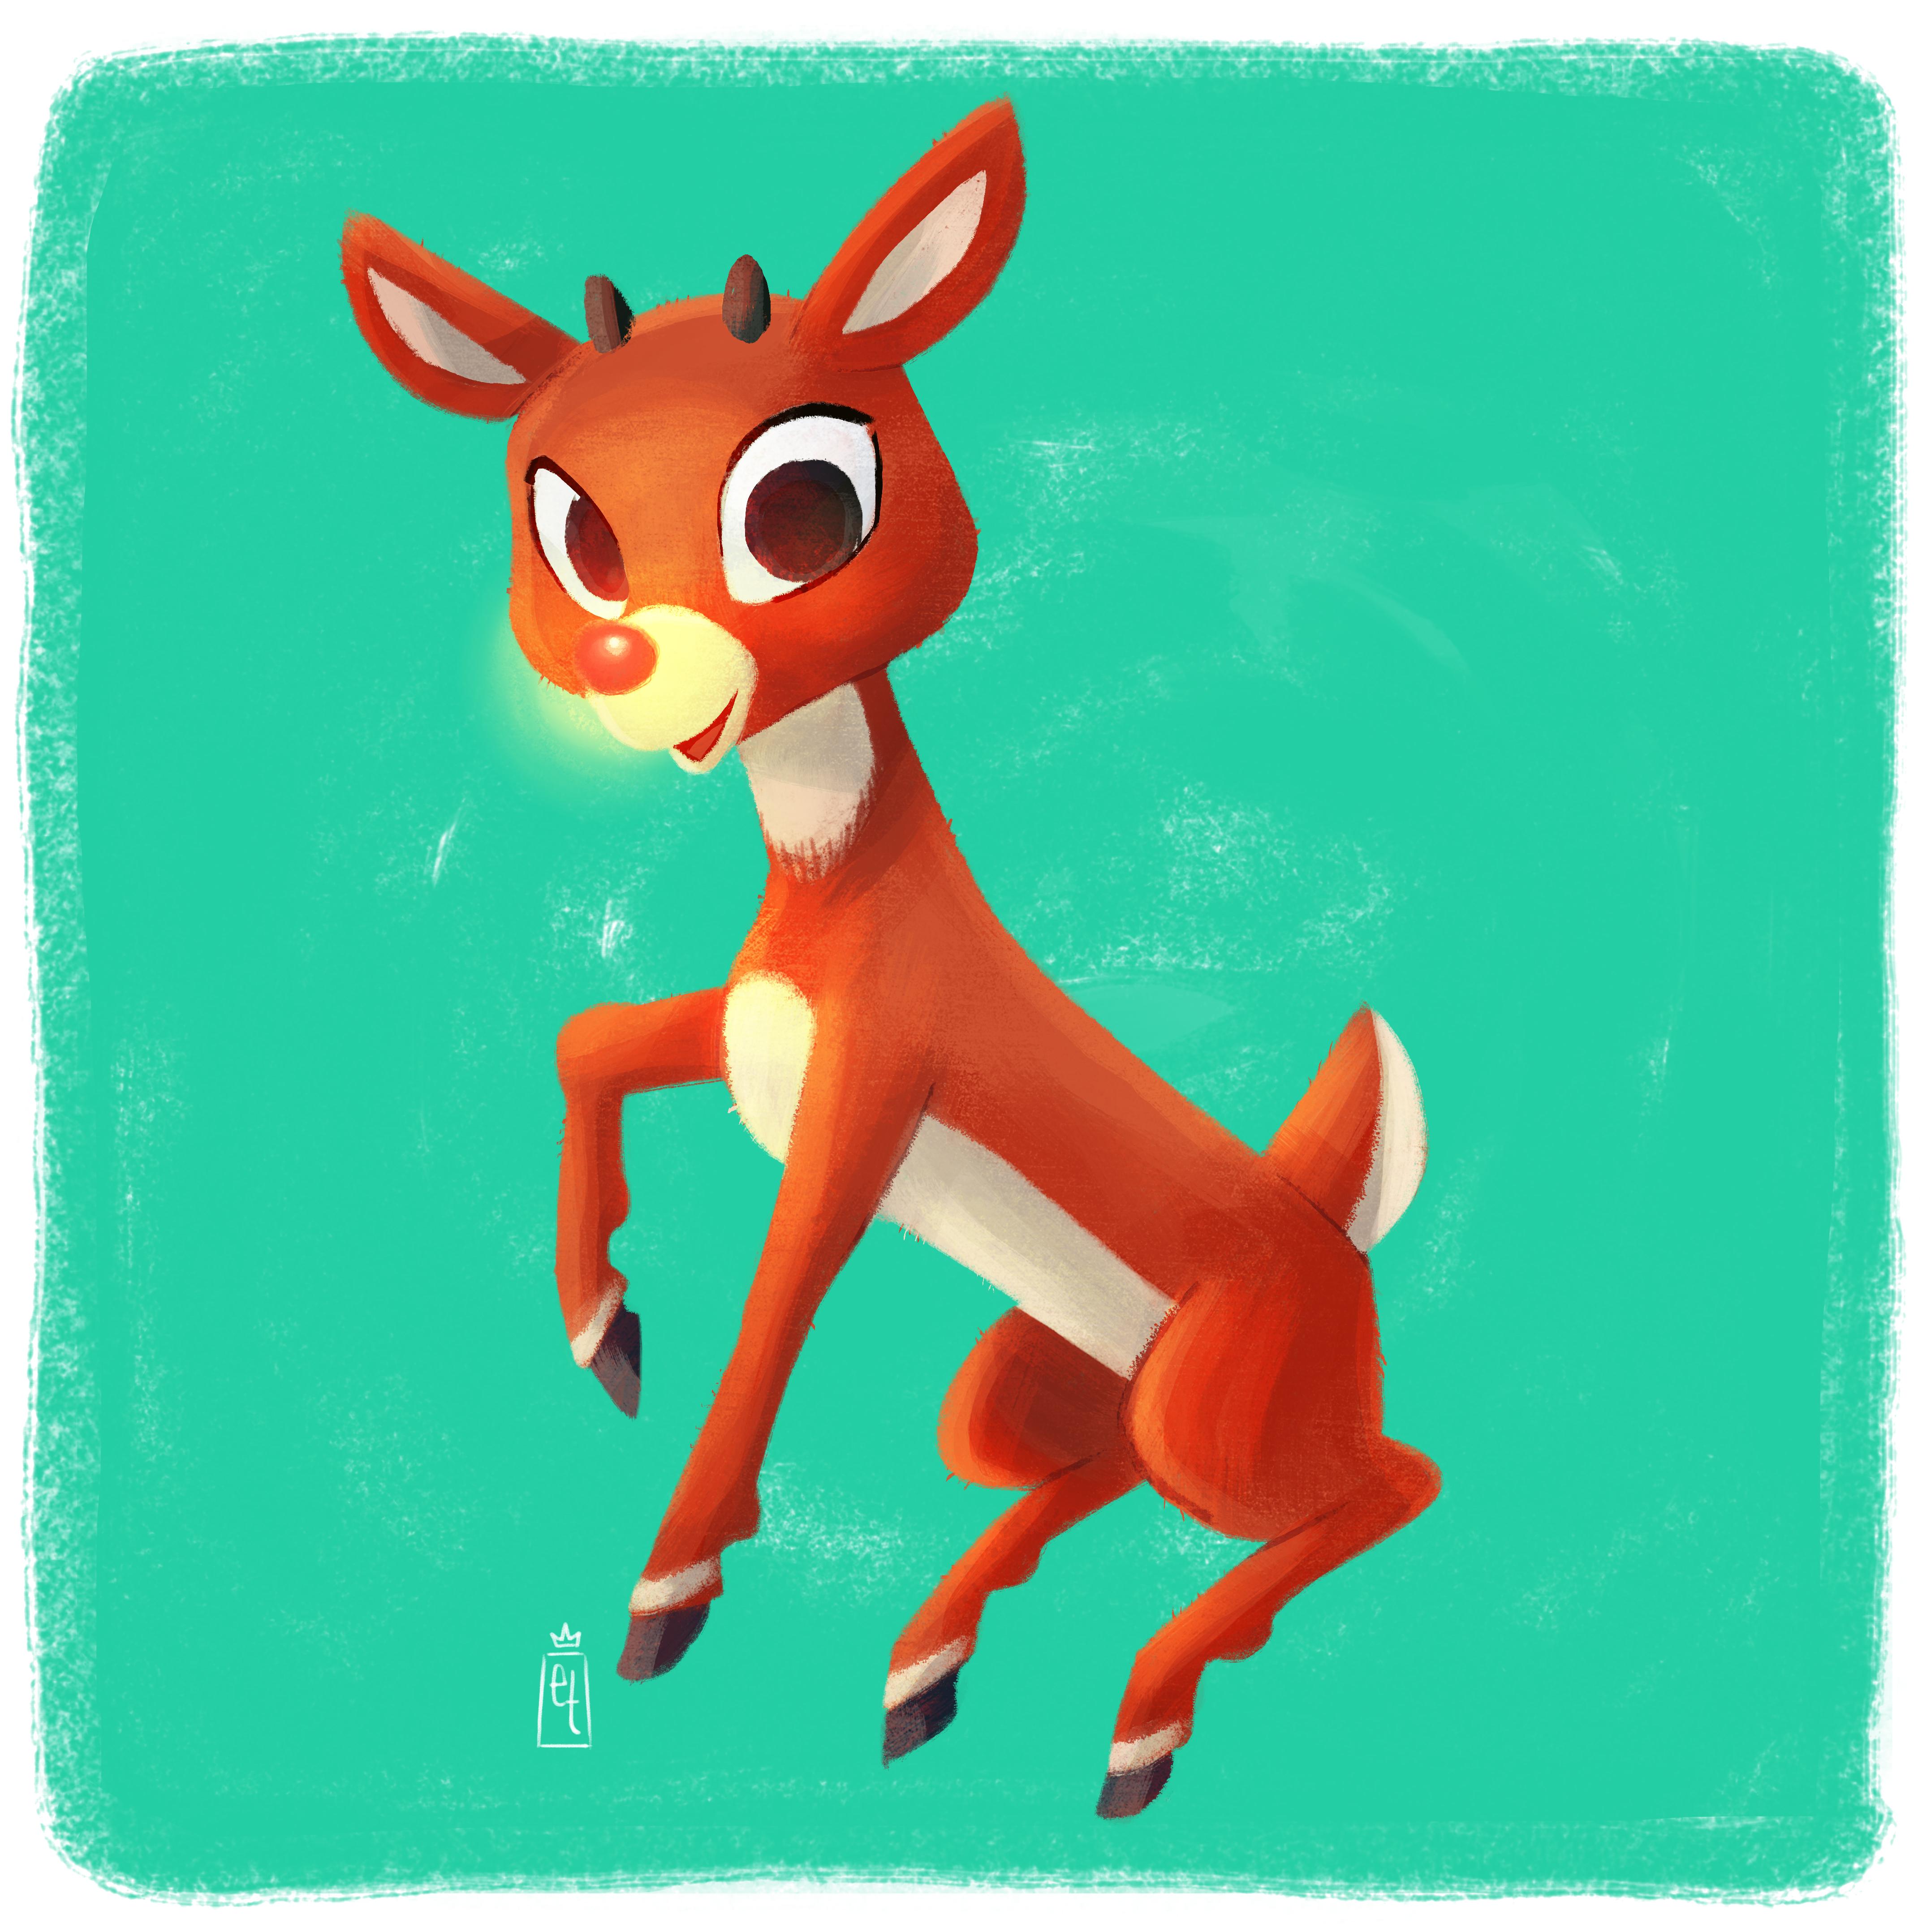 Rudolph_fanart